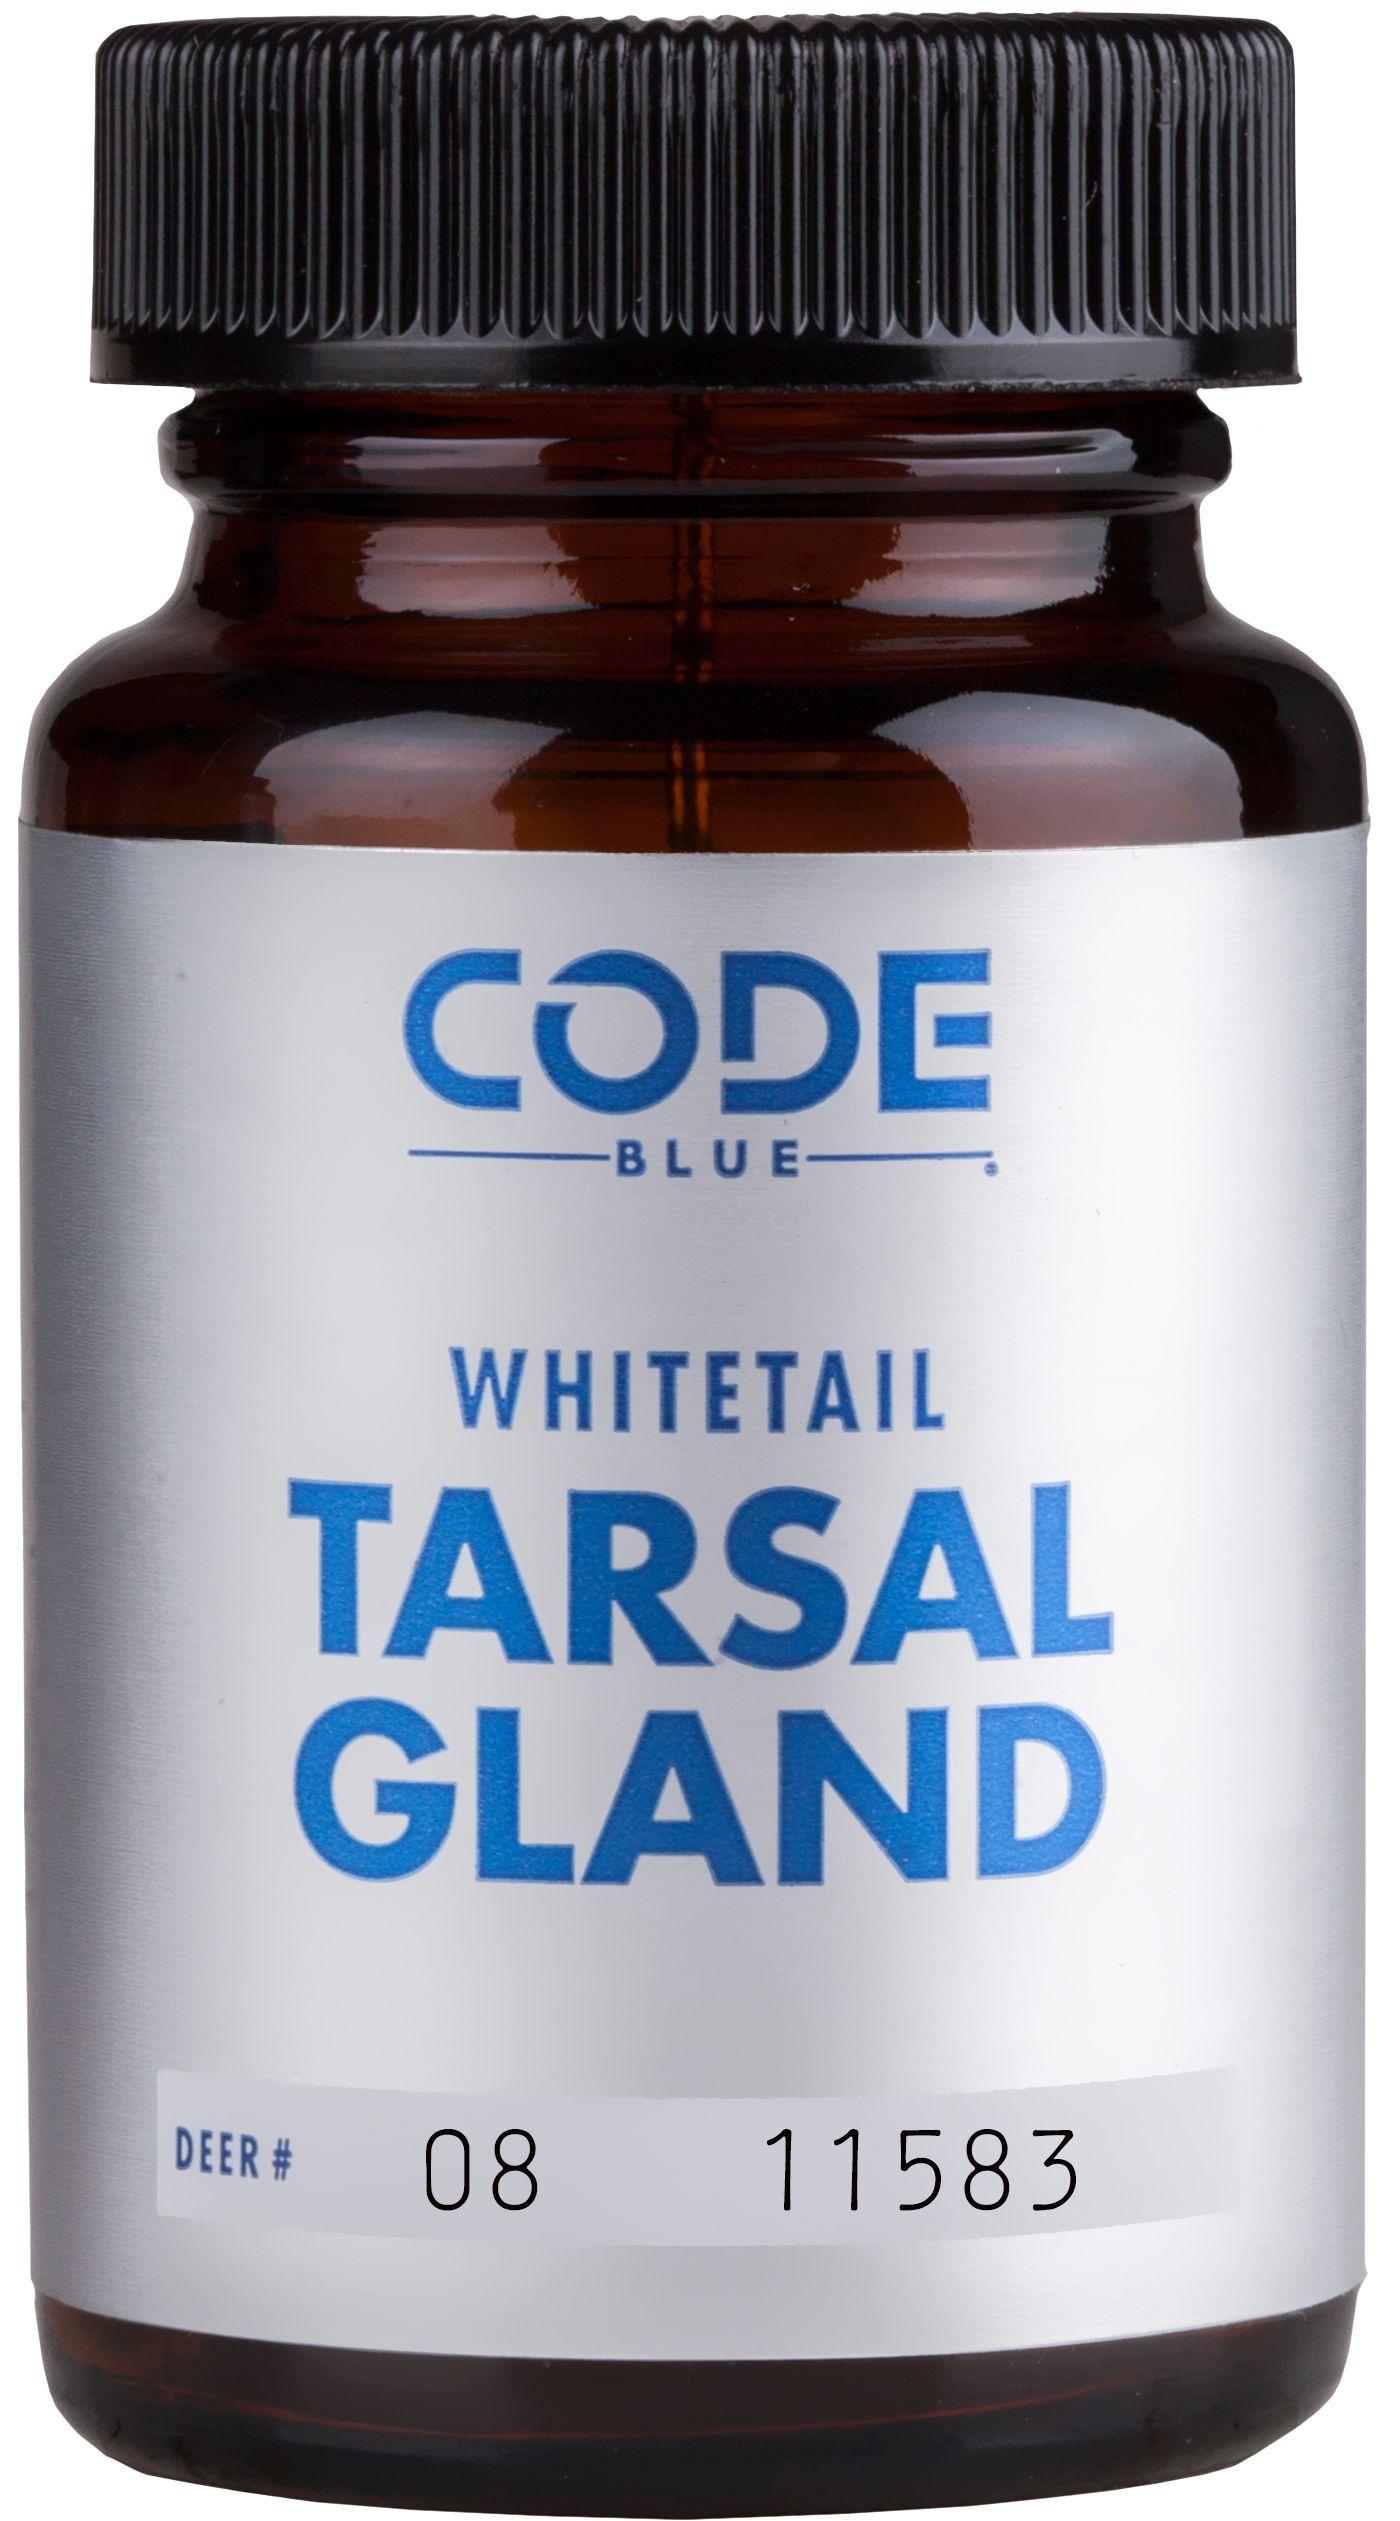 Code Blue Whitetail Tarsal Gland Deer Attractant